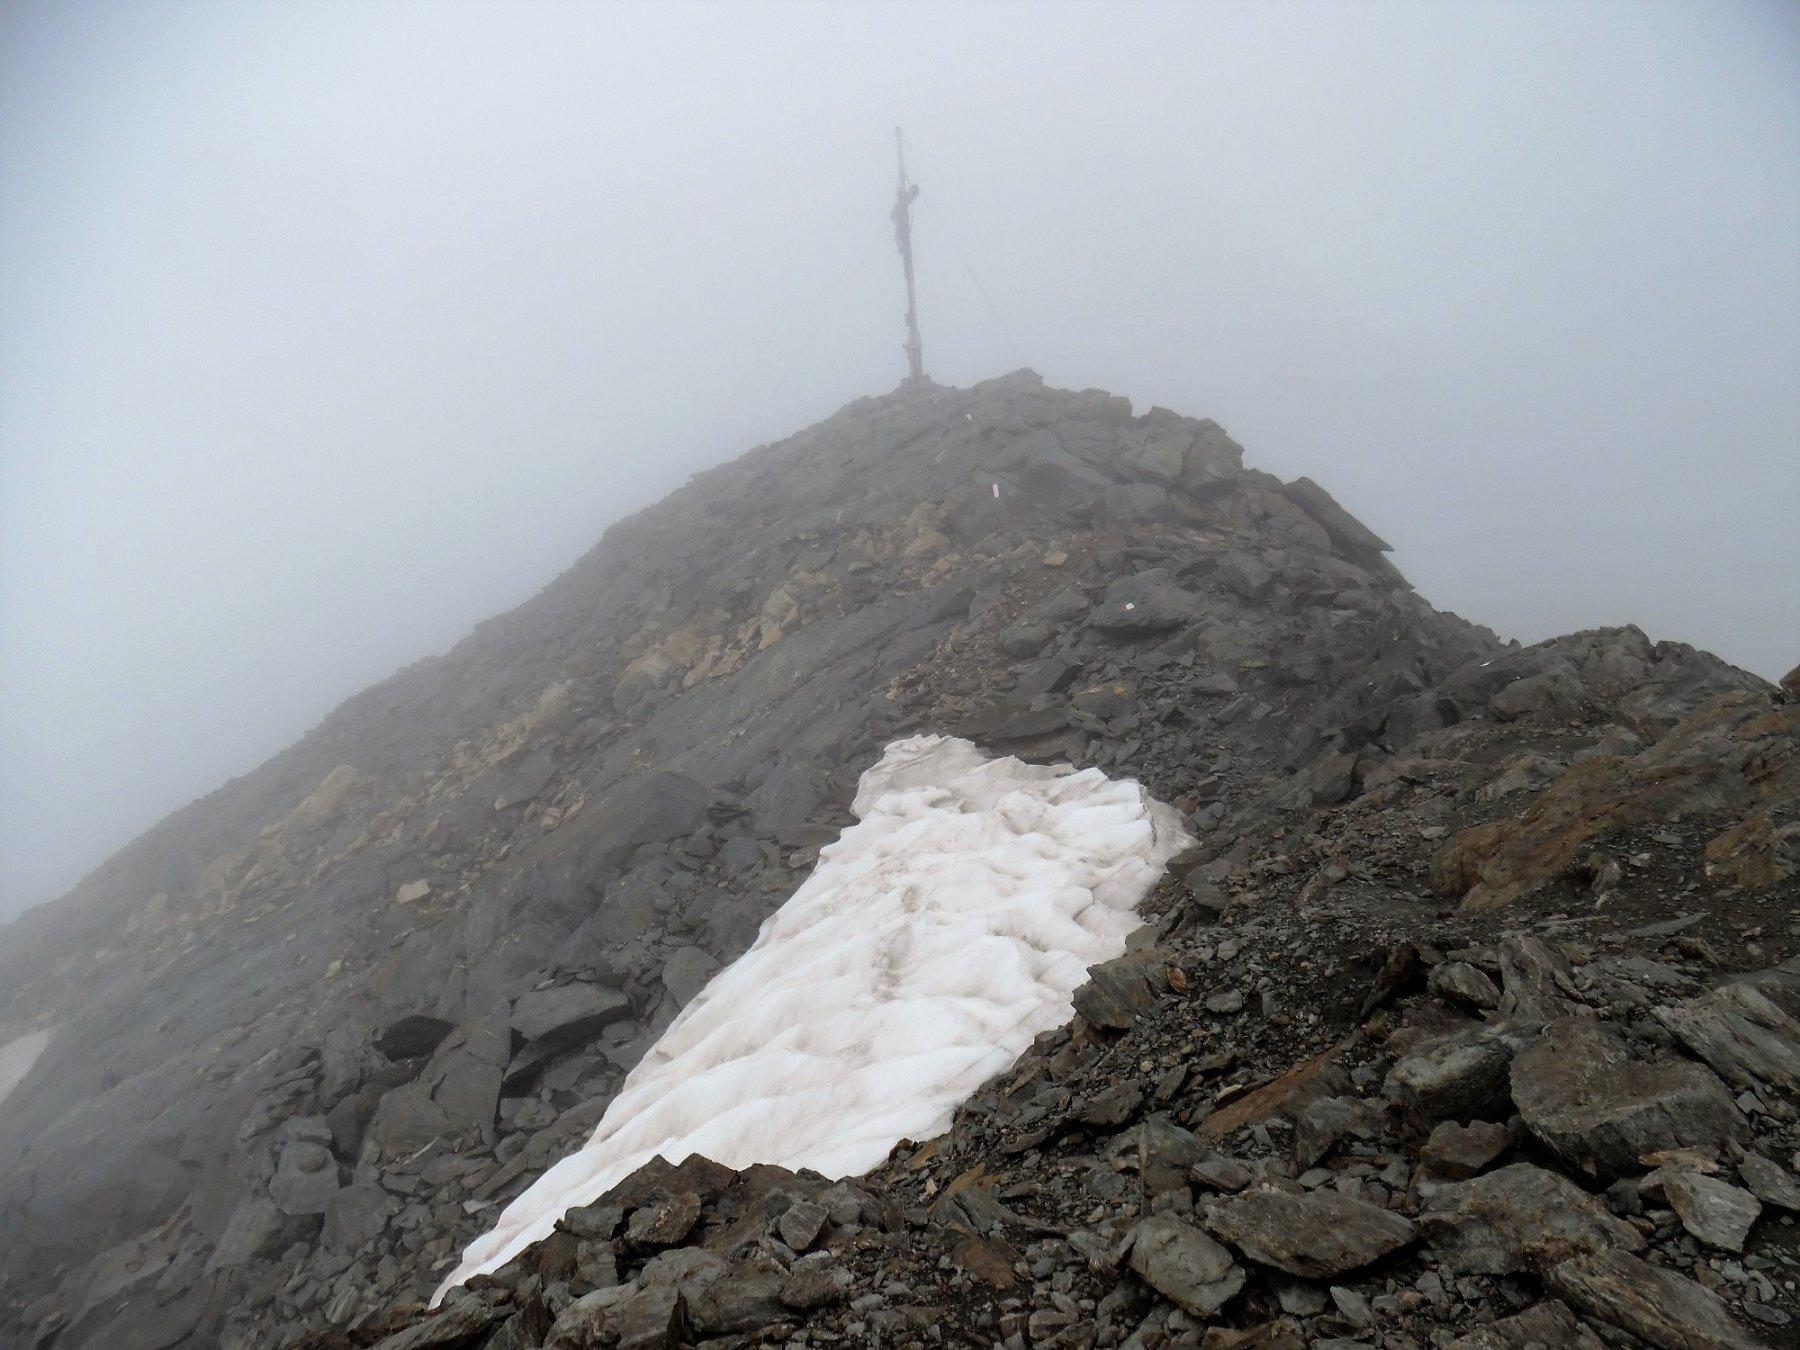 Orecchia di Lepre (Hasenoehr) 3257 m